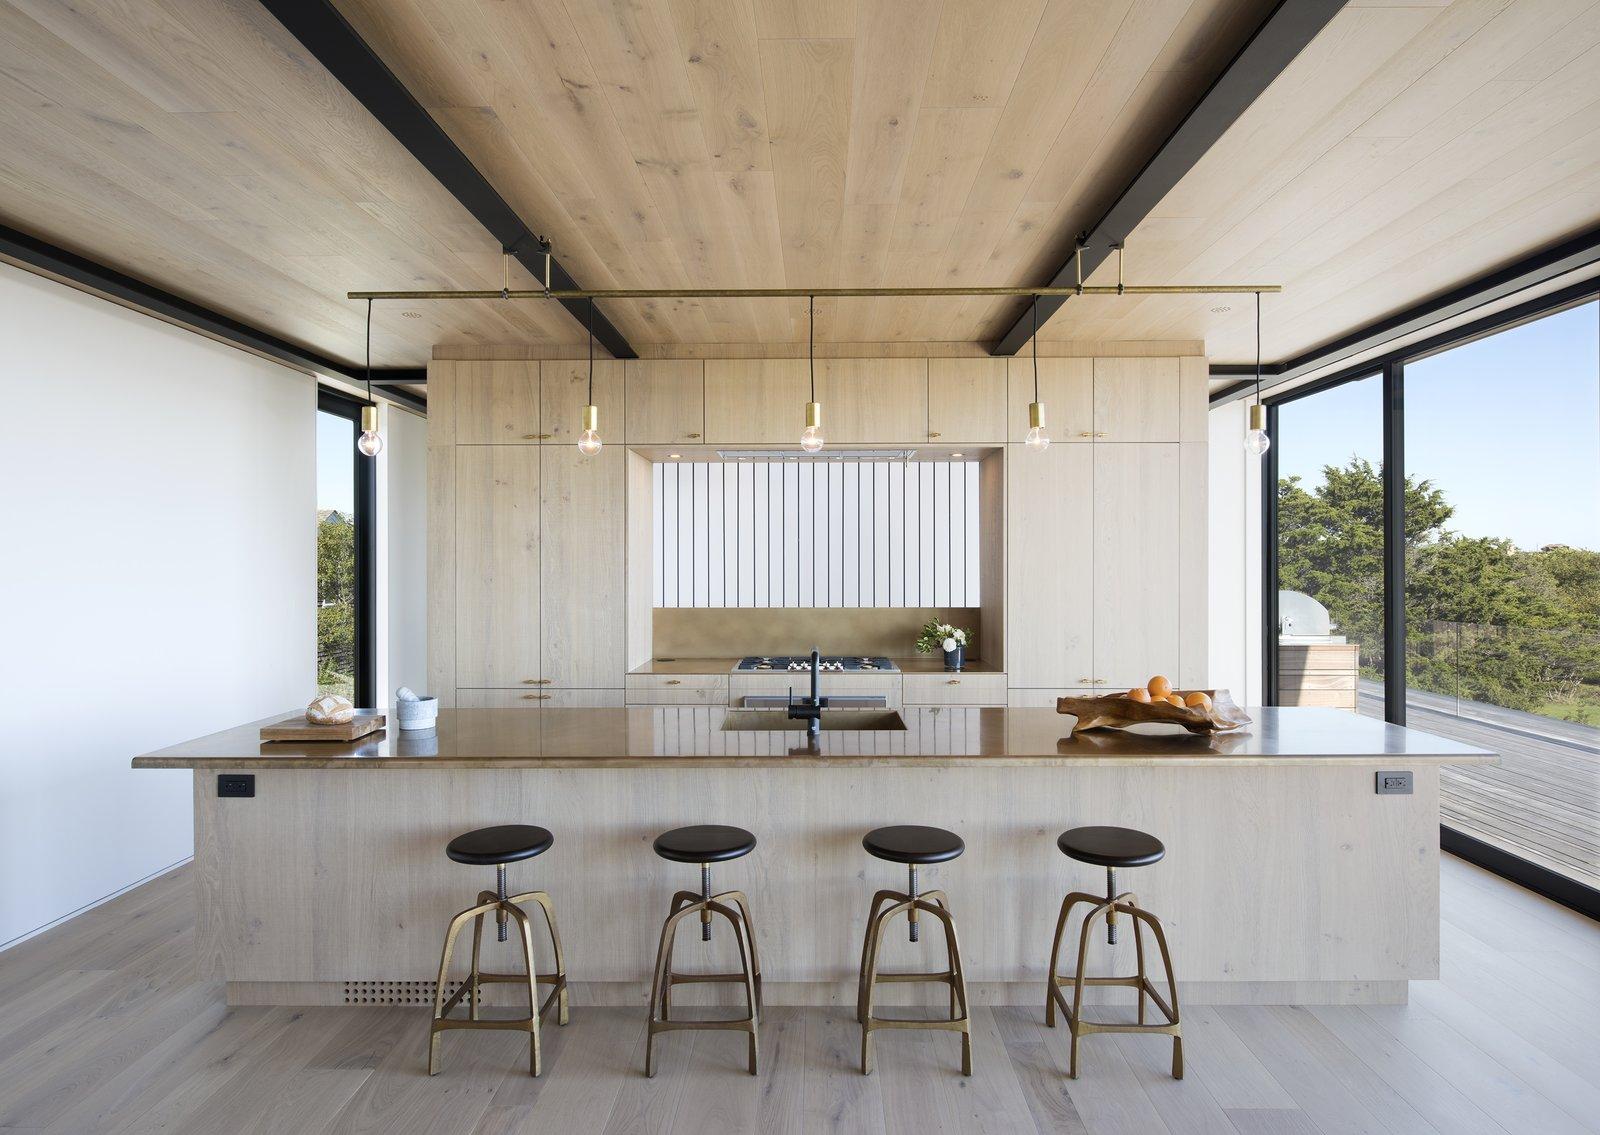 Kitchen, Ceiling Lighting, Light Hardwood Floor, Wood Cabinet, Recessed Lighting, Engineered Quartz Counter, Range, Drop In Sink, and Refrigerator  Best Photos from Amagansett Landmark